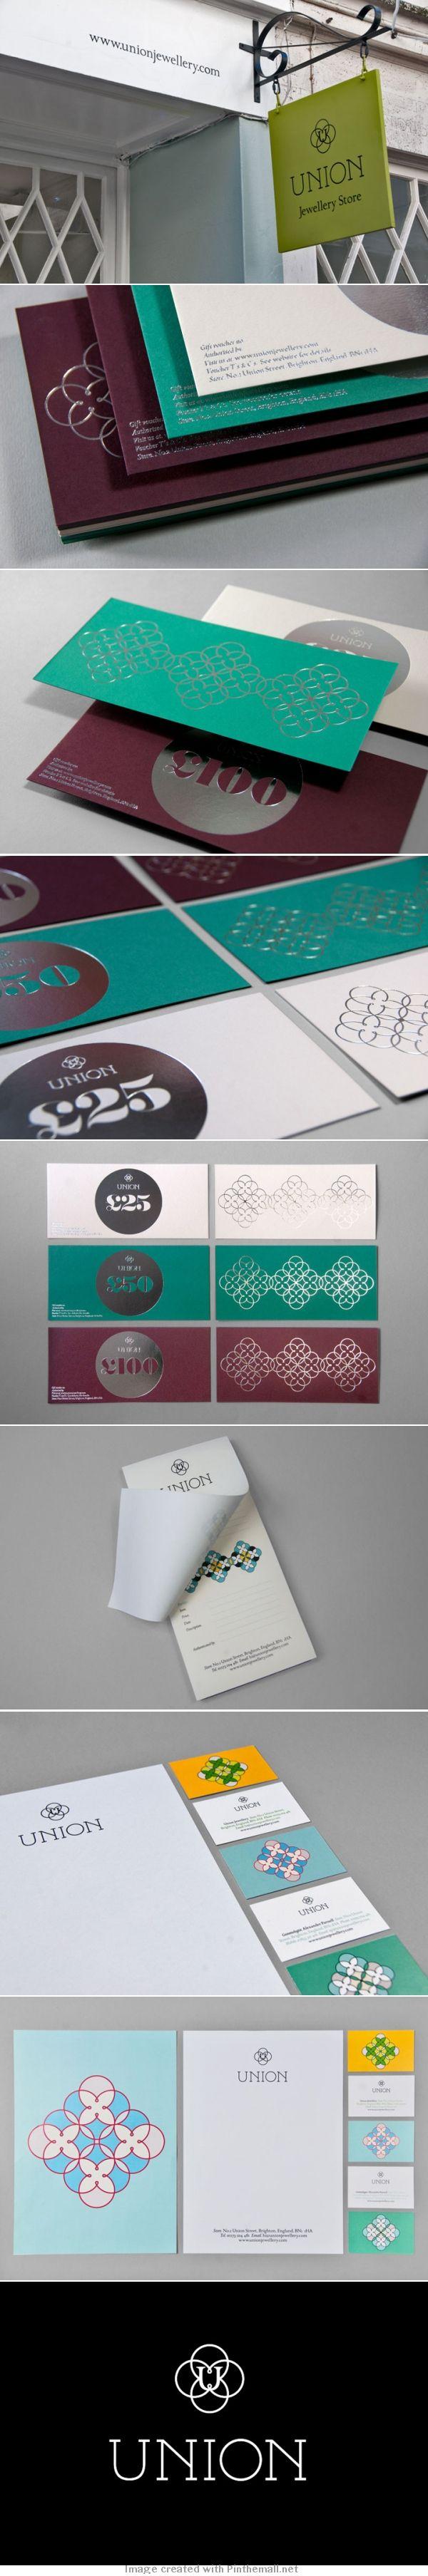 Union jewellery branding by Red Design